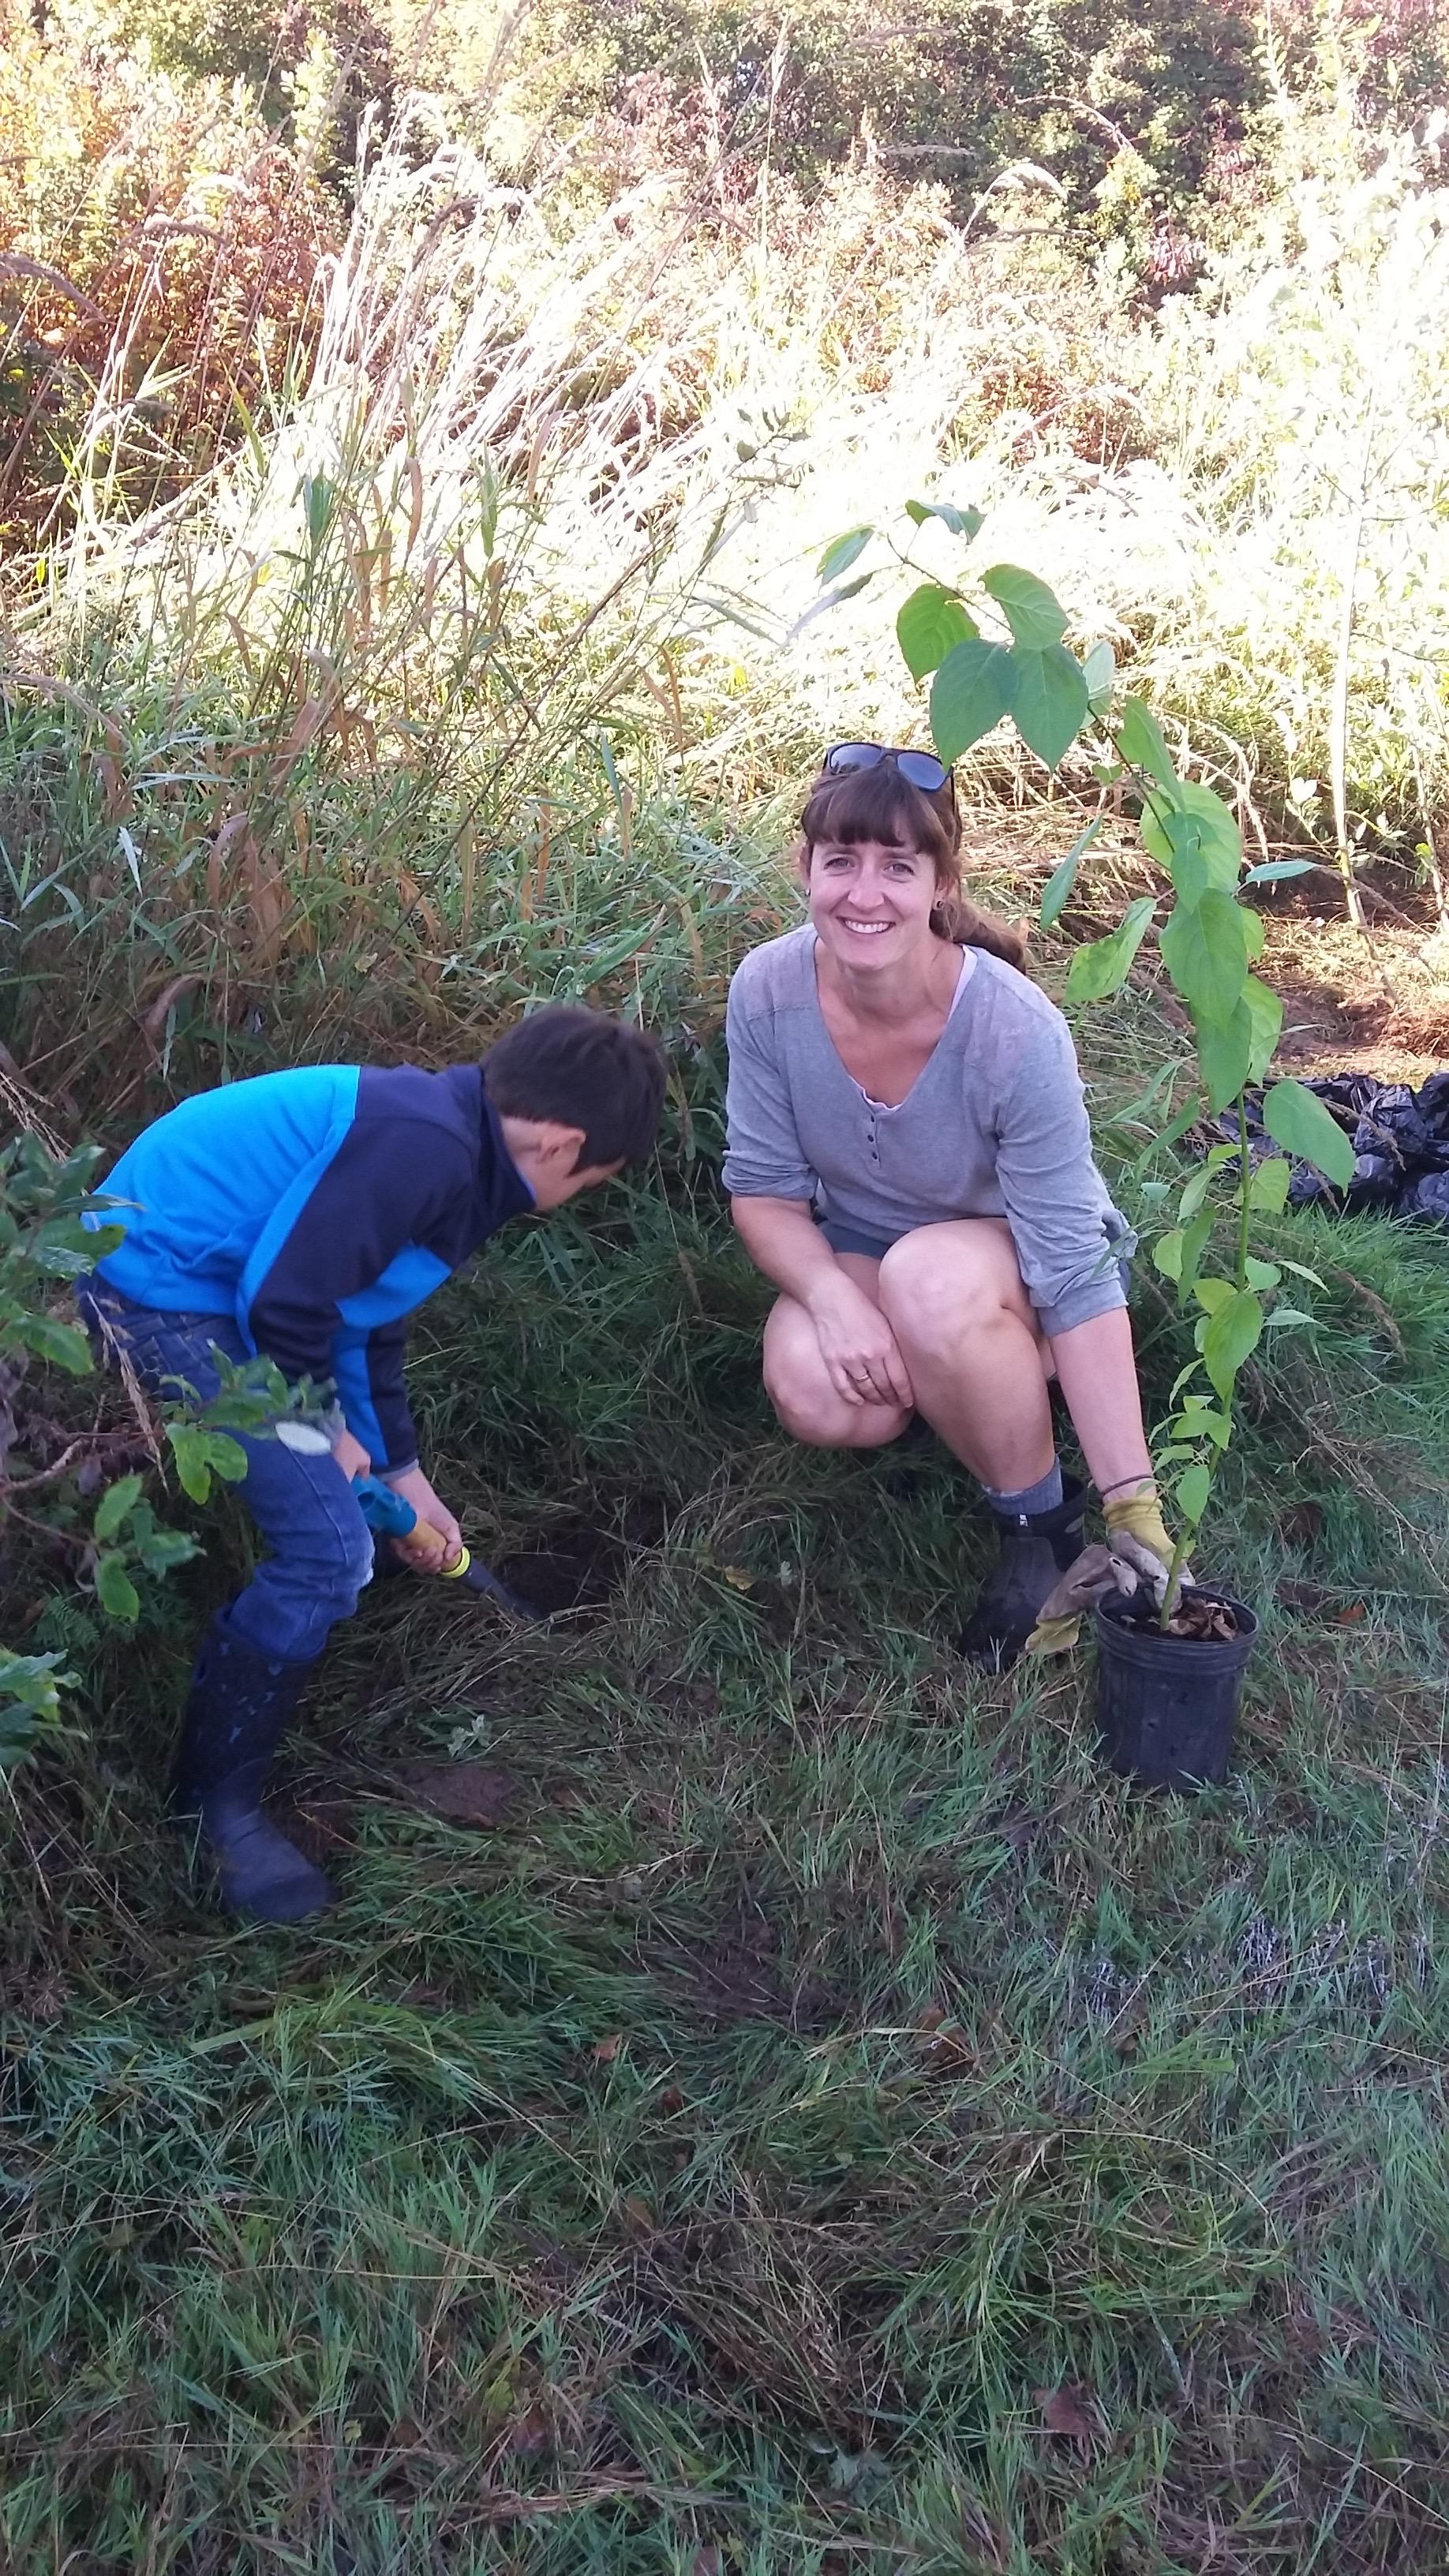 Planting riparian species at Somenos Creek - Photo by Elizabeth Aitken